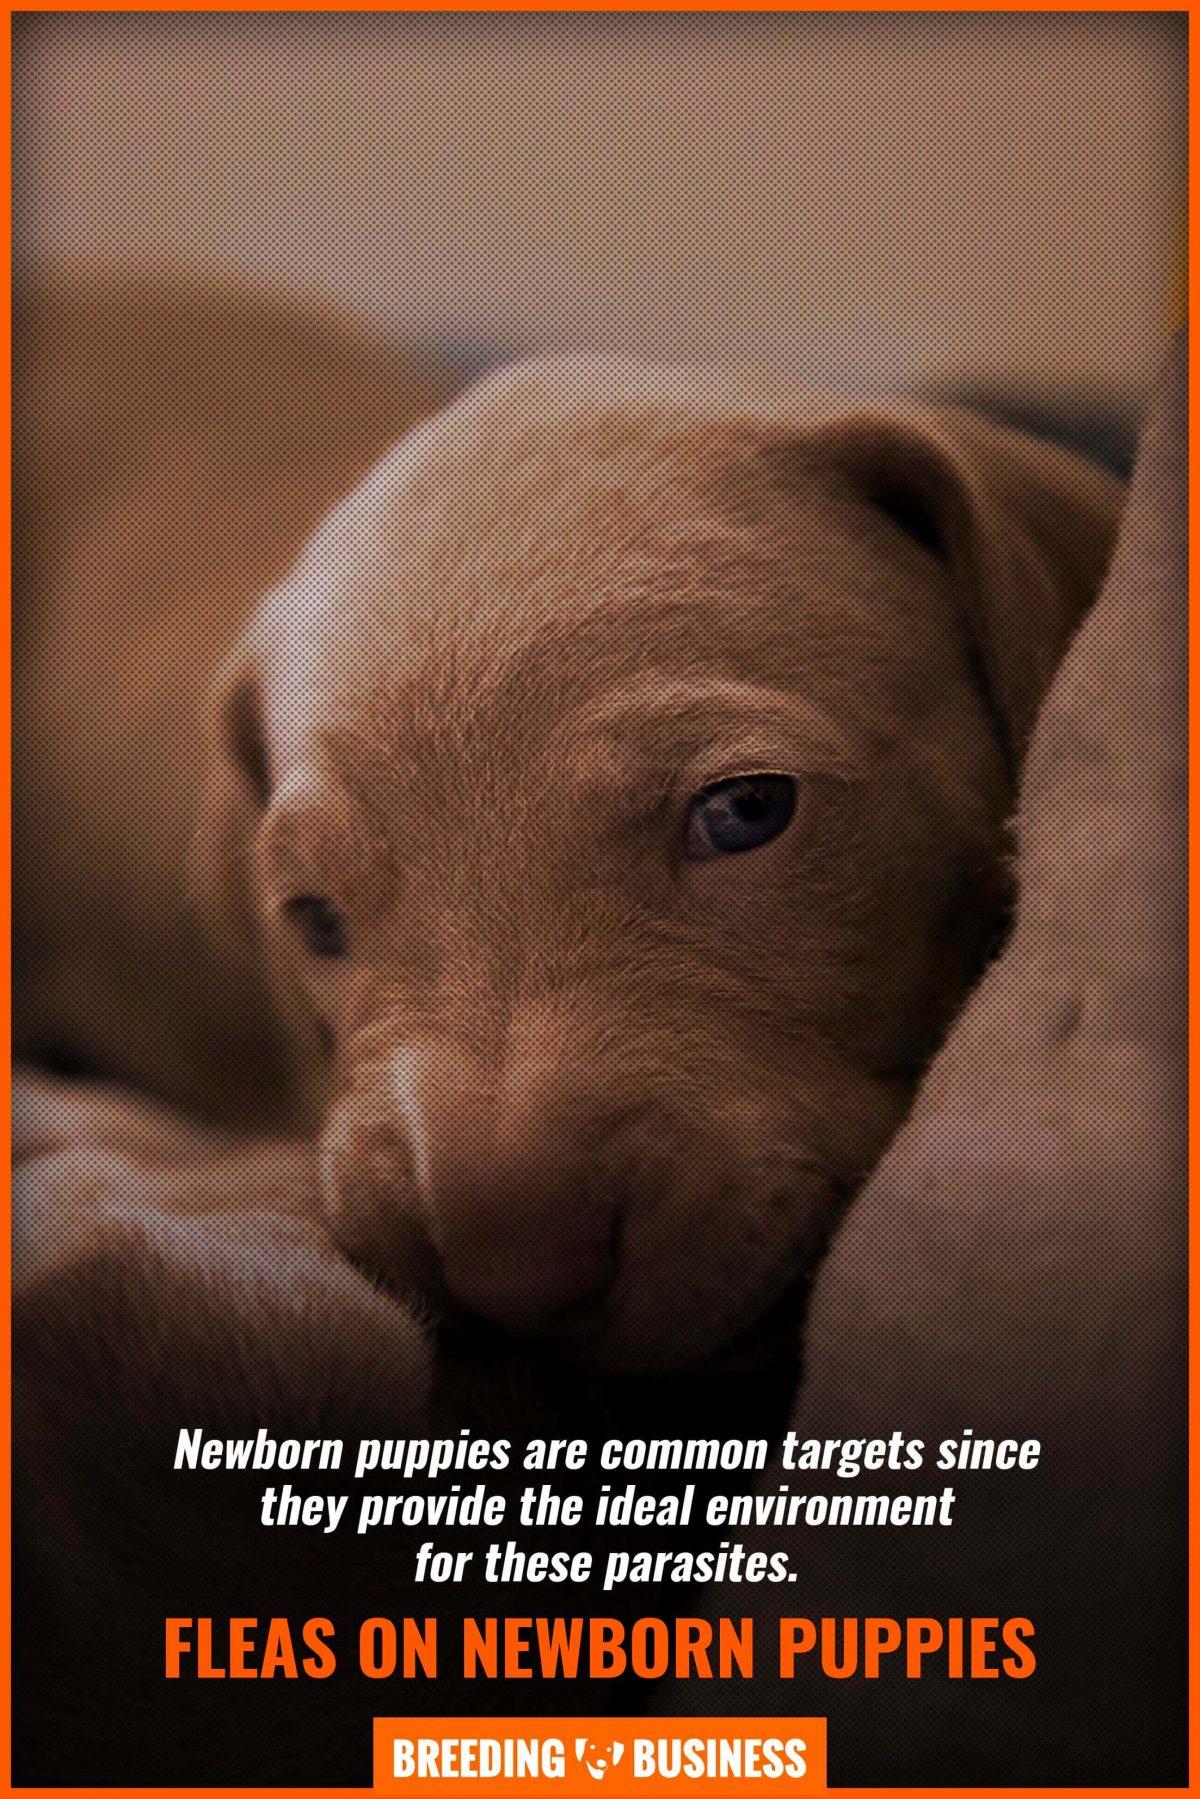 fleas on newborn puppies